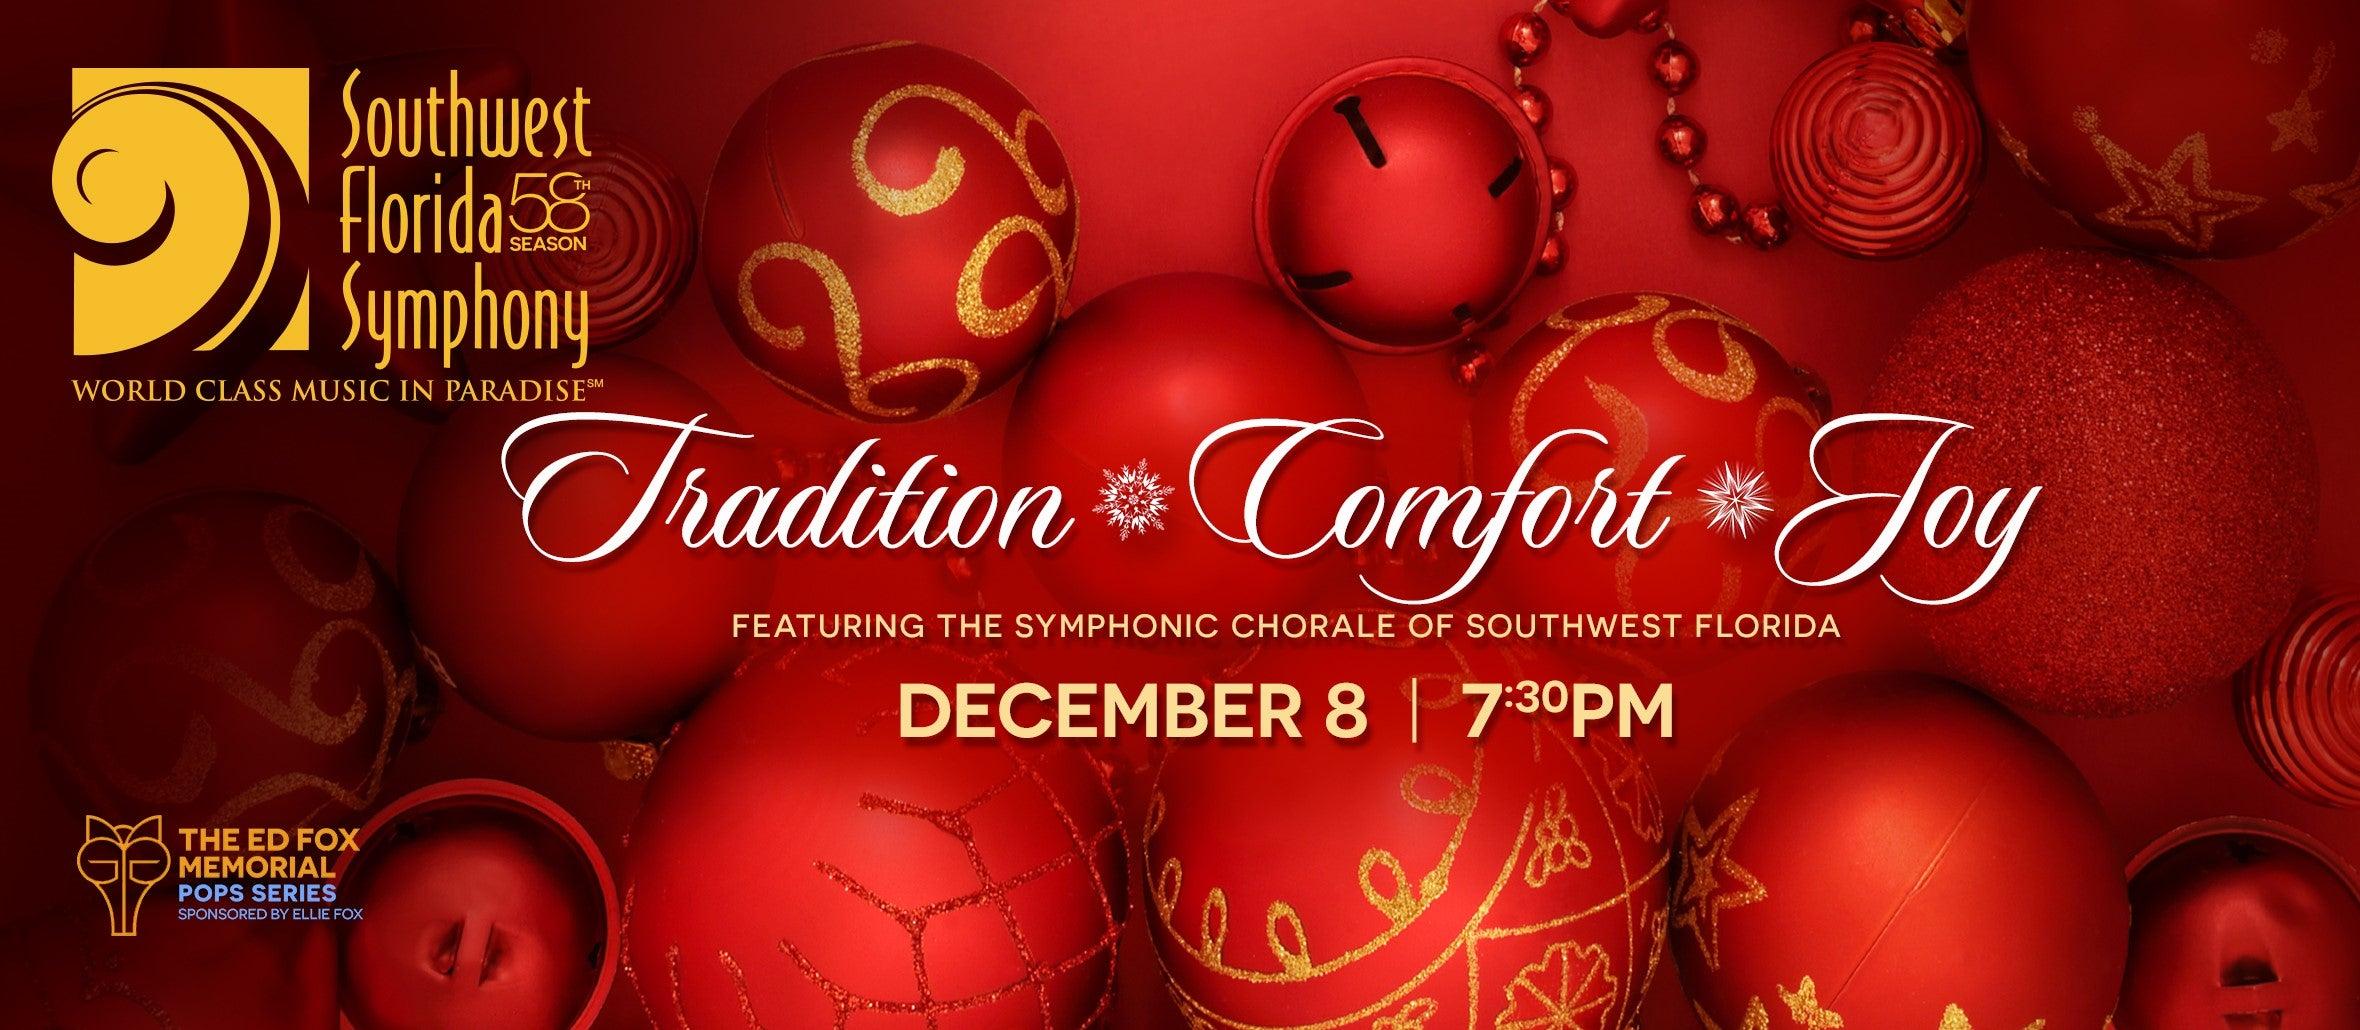 Southwest Florida Symphony: Tradition. Comfort. Joy